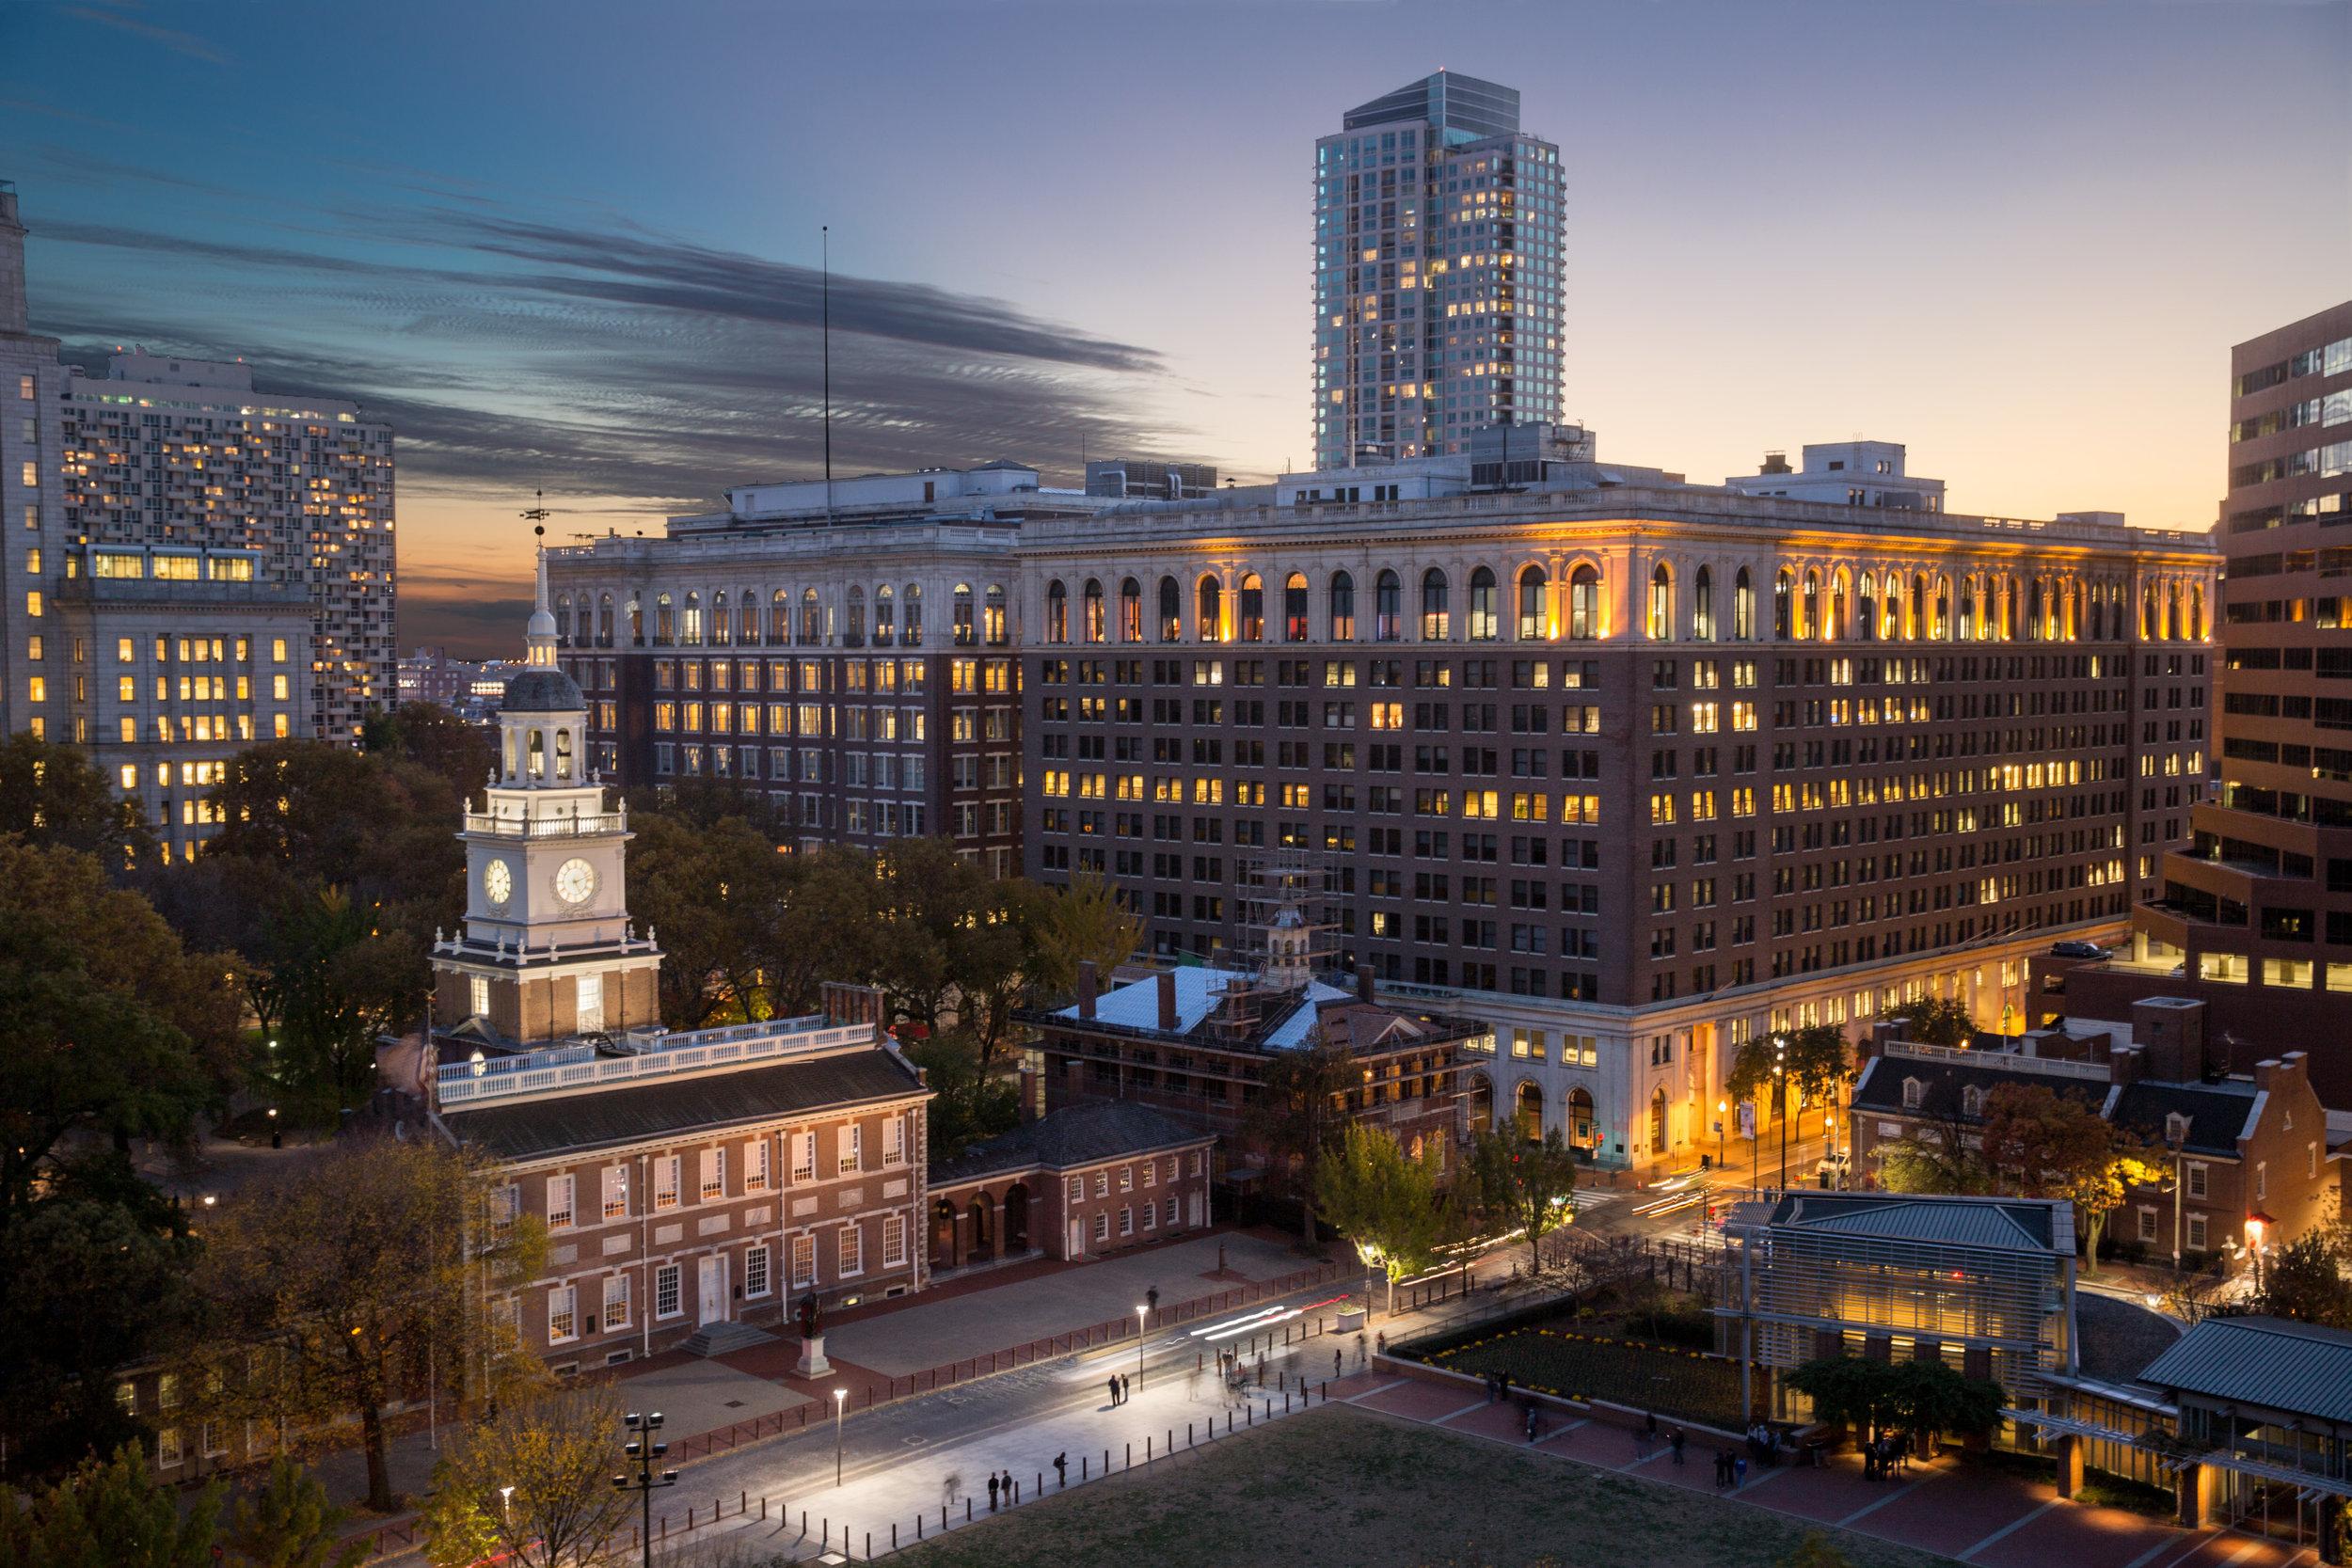 View of Independence Hall and surrounding neighborhood.